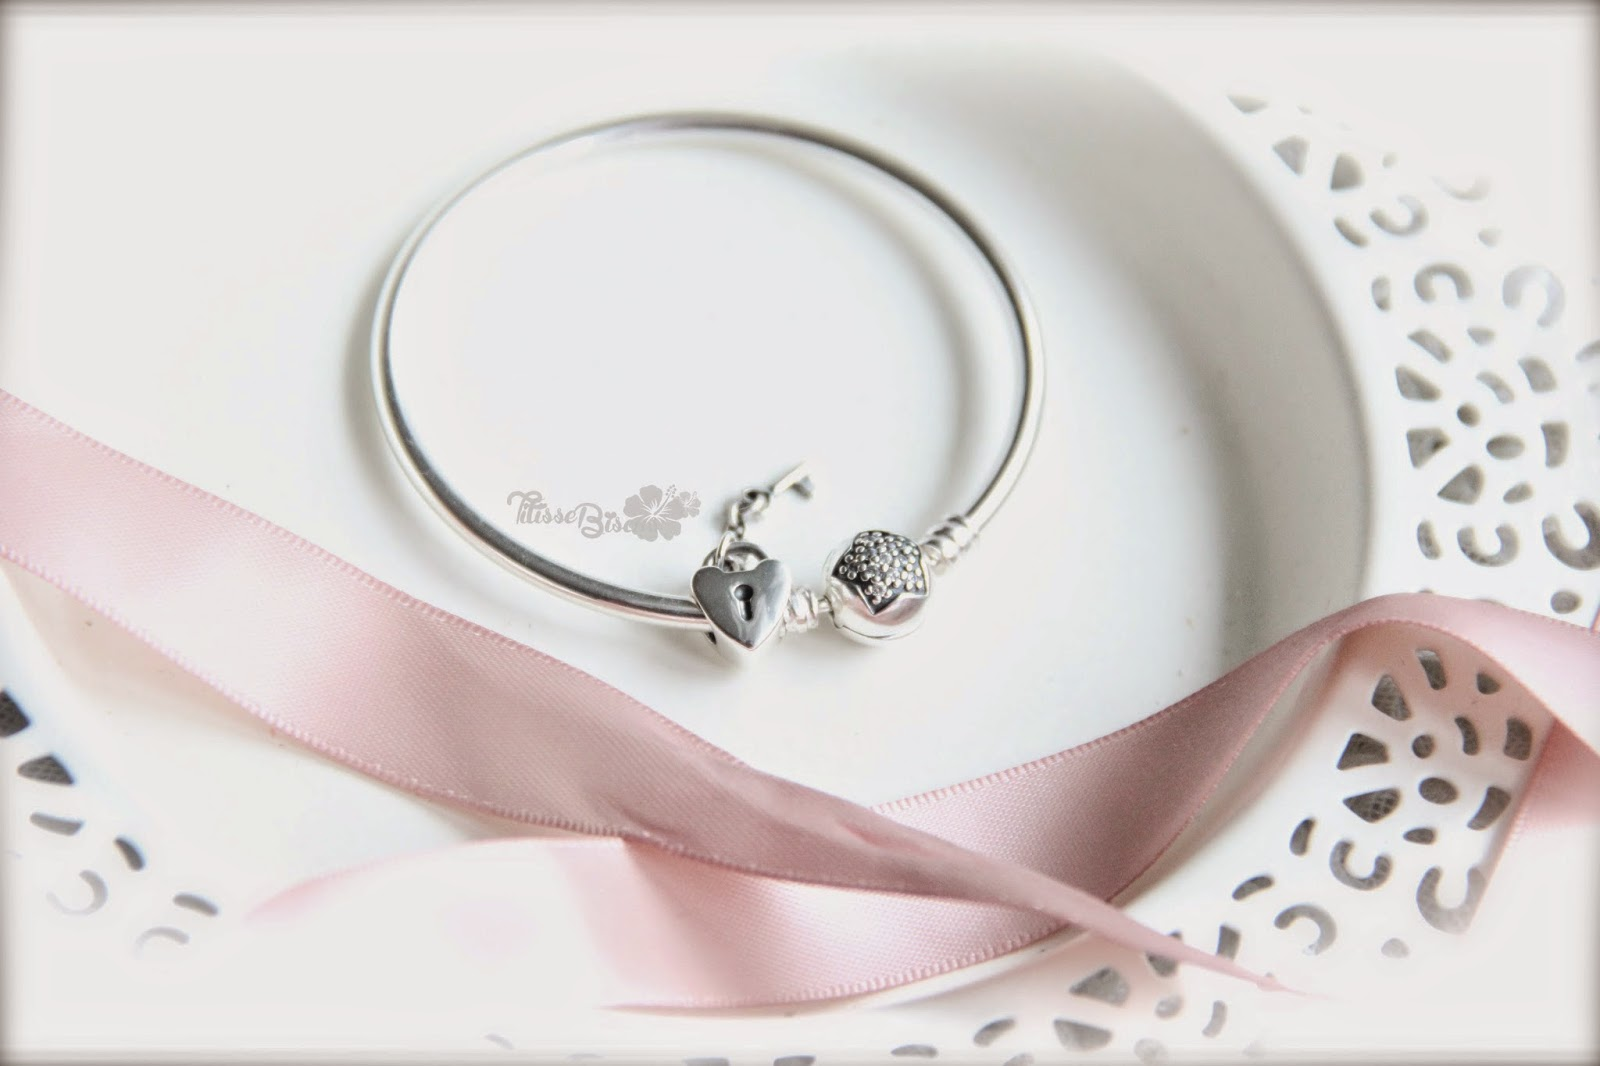 nouveau bracelet pandora rigide